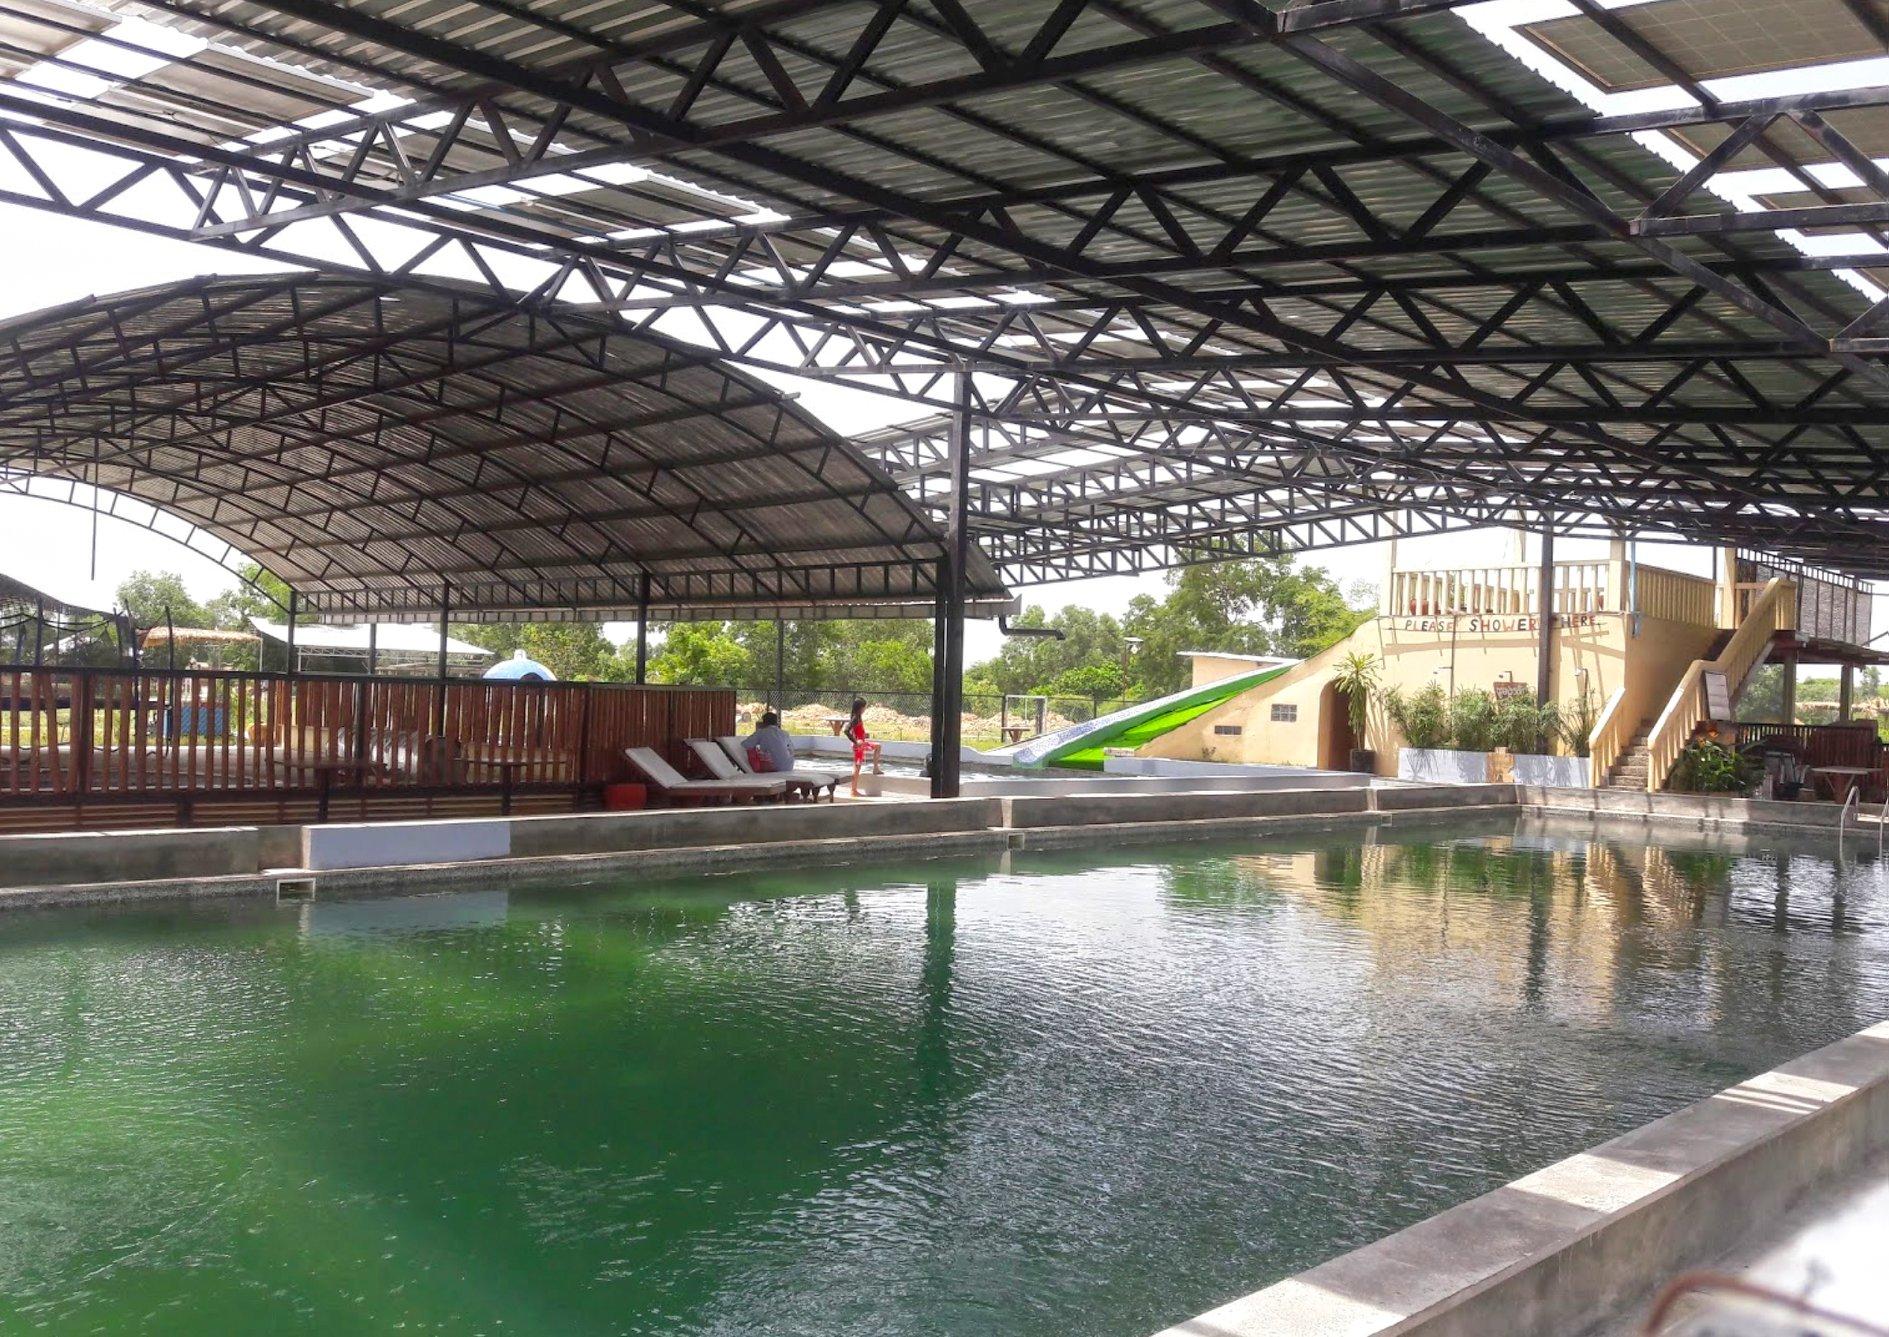 Seametrey Leisure Centre